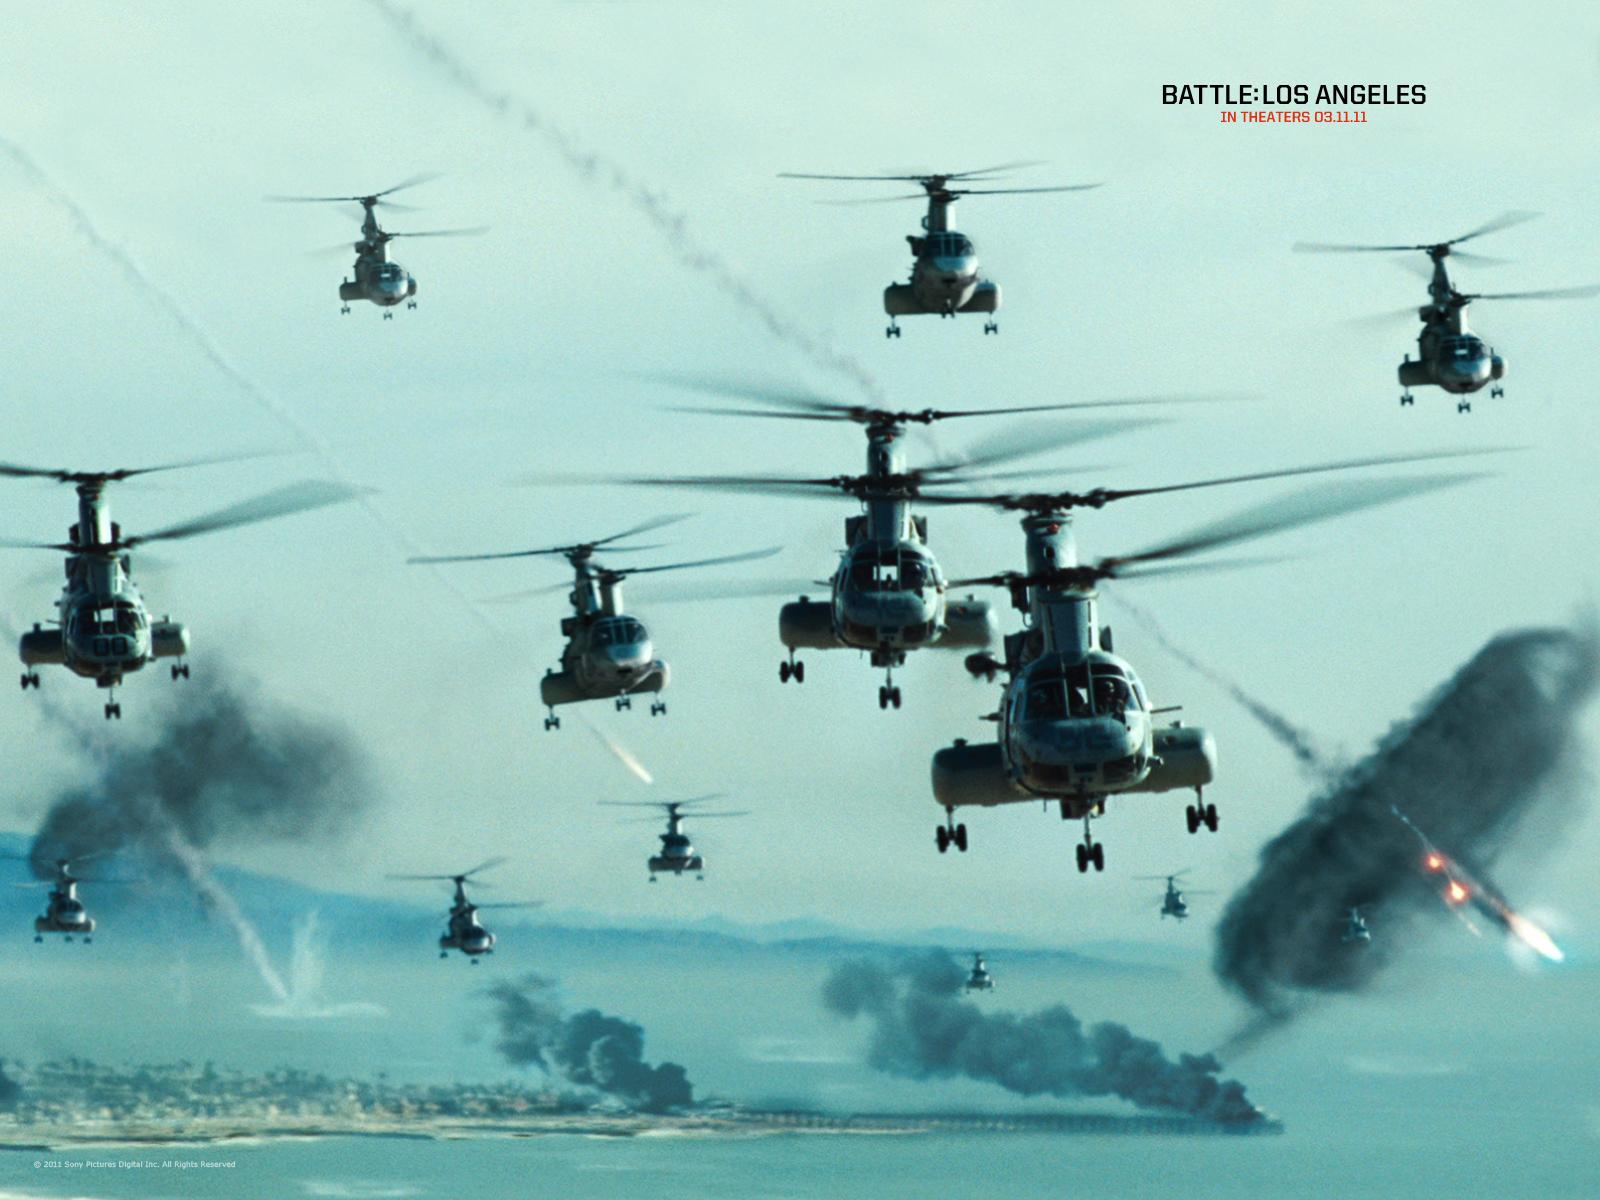 http://3.bp.blogspot.com/-BqGpi0LYEX0/TtcbetUPe8I/AAAAAAAAAfc/_qTaeM5TLBo/s1600/battle-los-angeles-wallpaper-2_1600x1200_89346.jpg